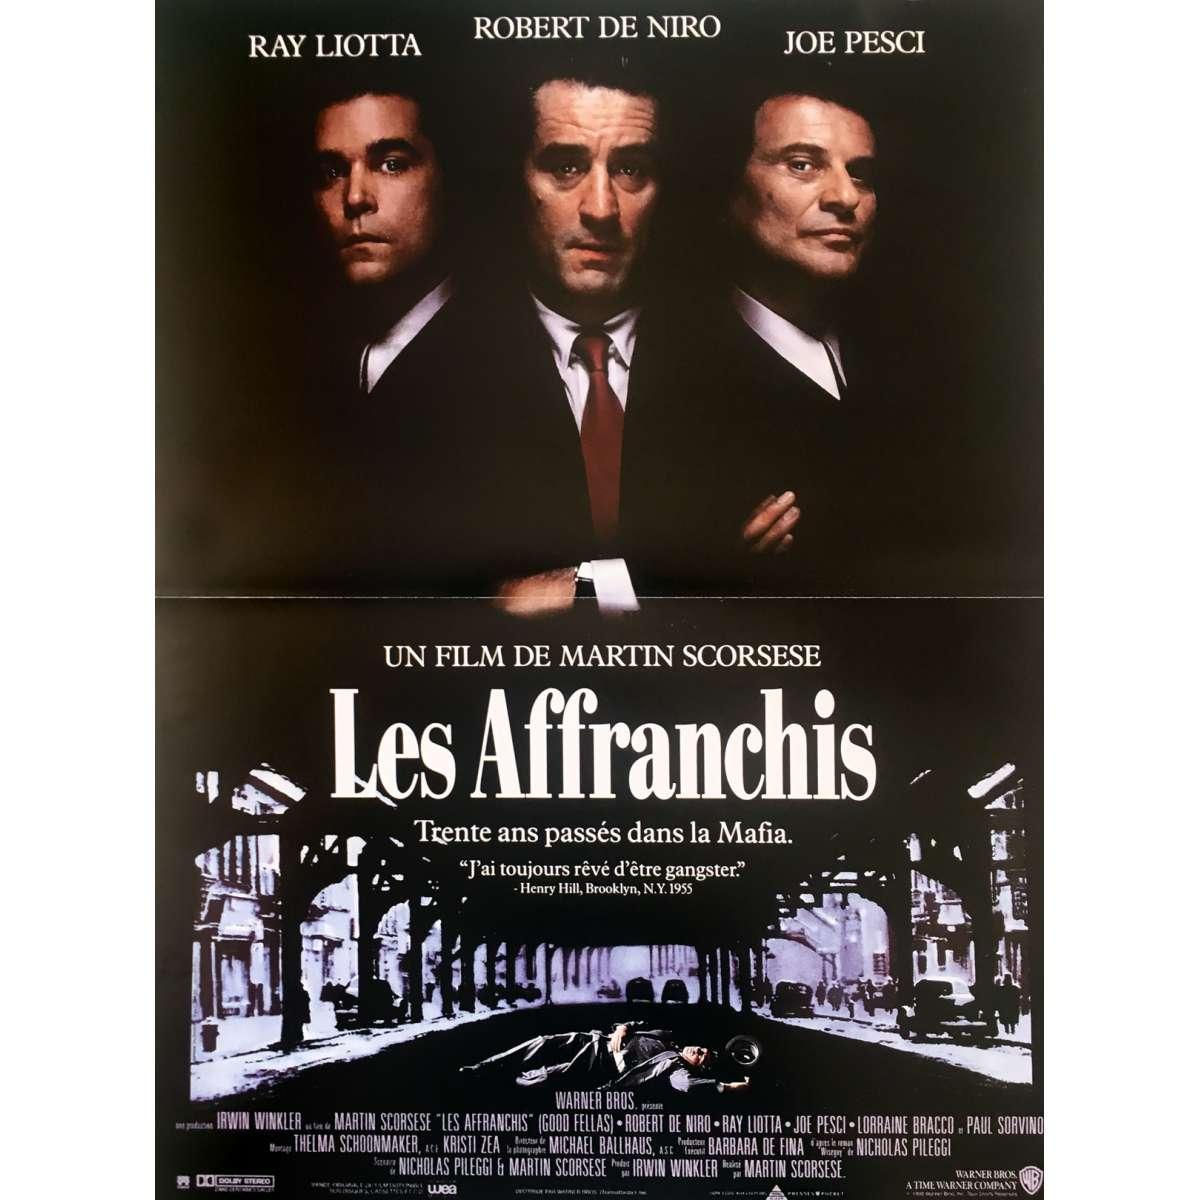 goodfellas movie poster 15x21 in 1990 martin scorsese robert de niro